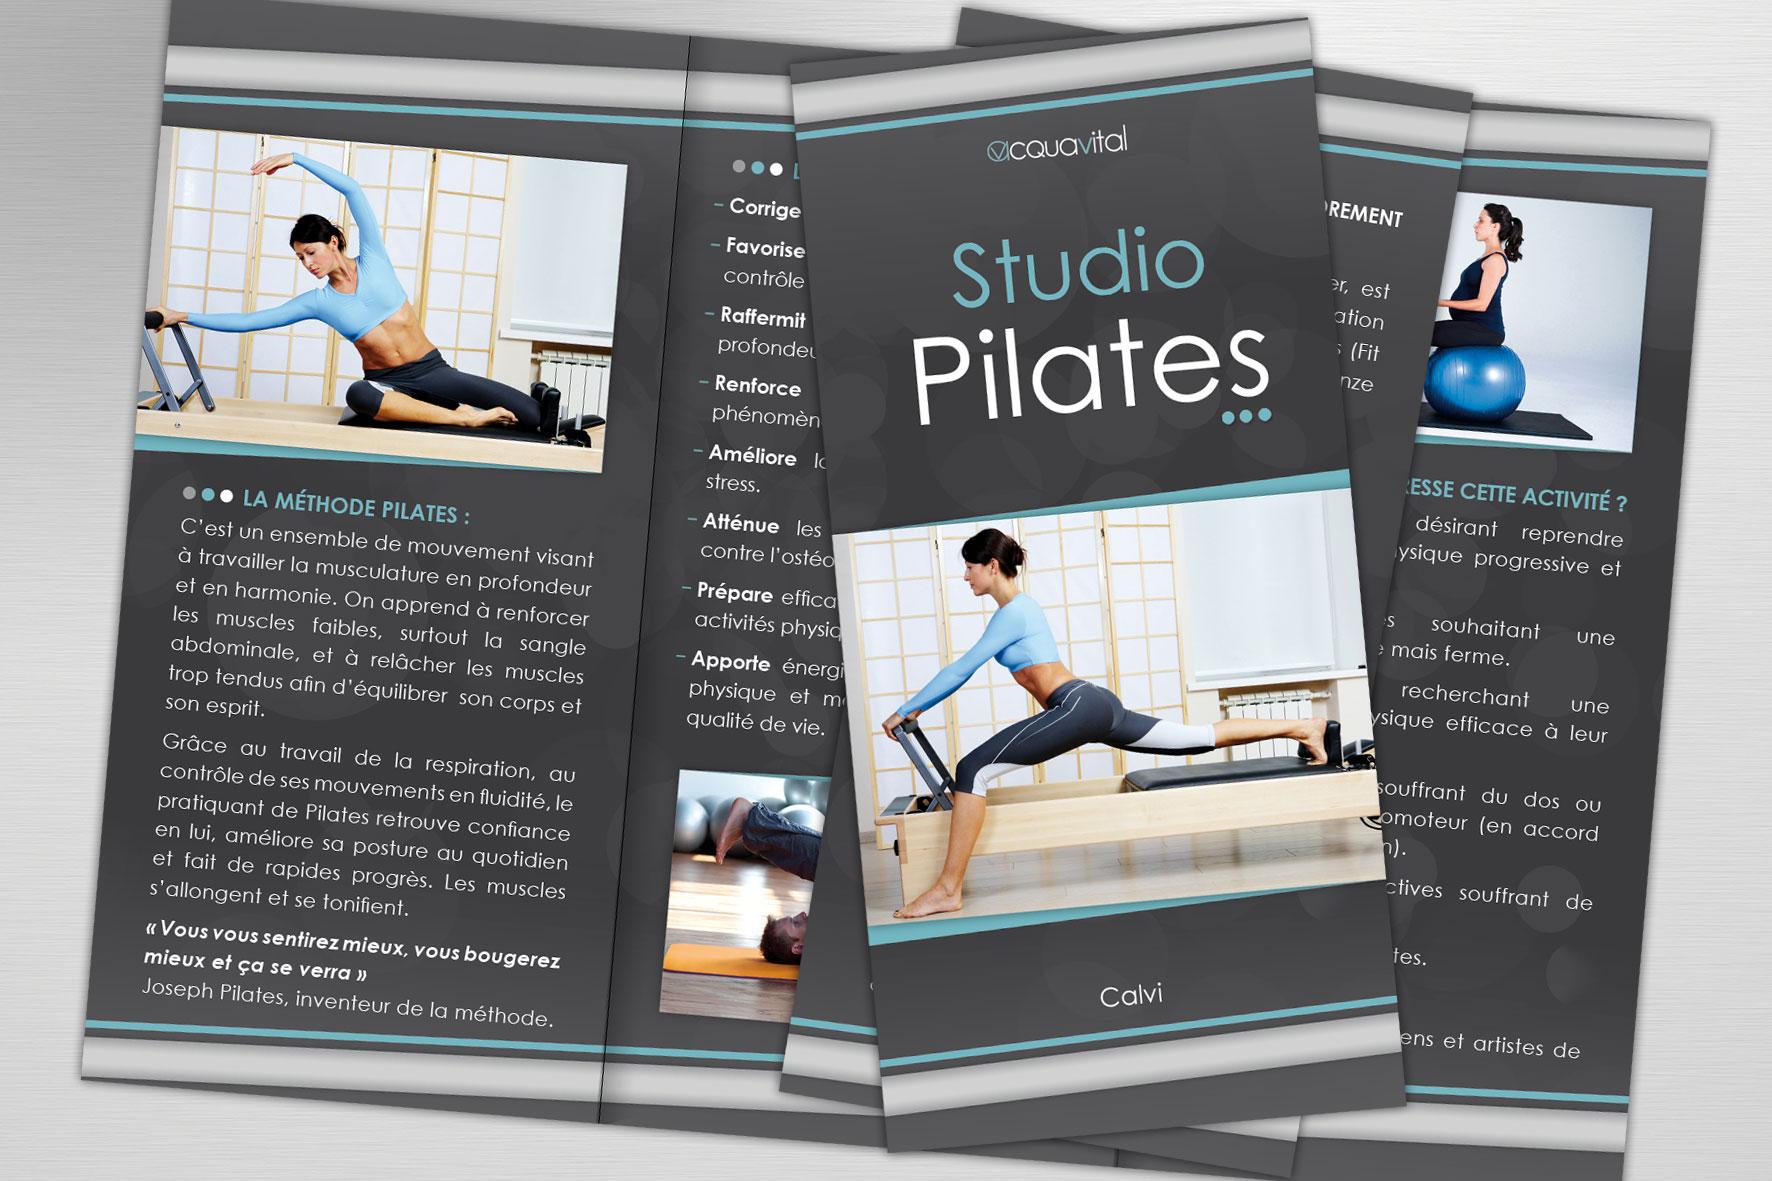 Acquavital Calvi - Studio Pilates